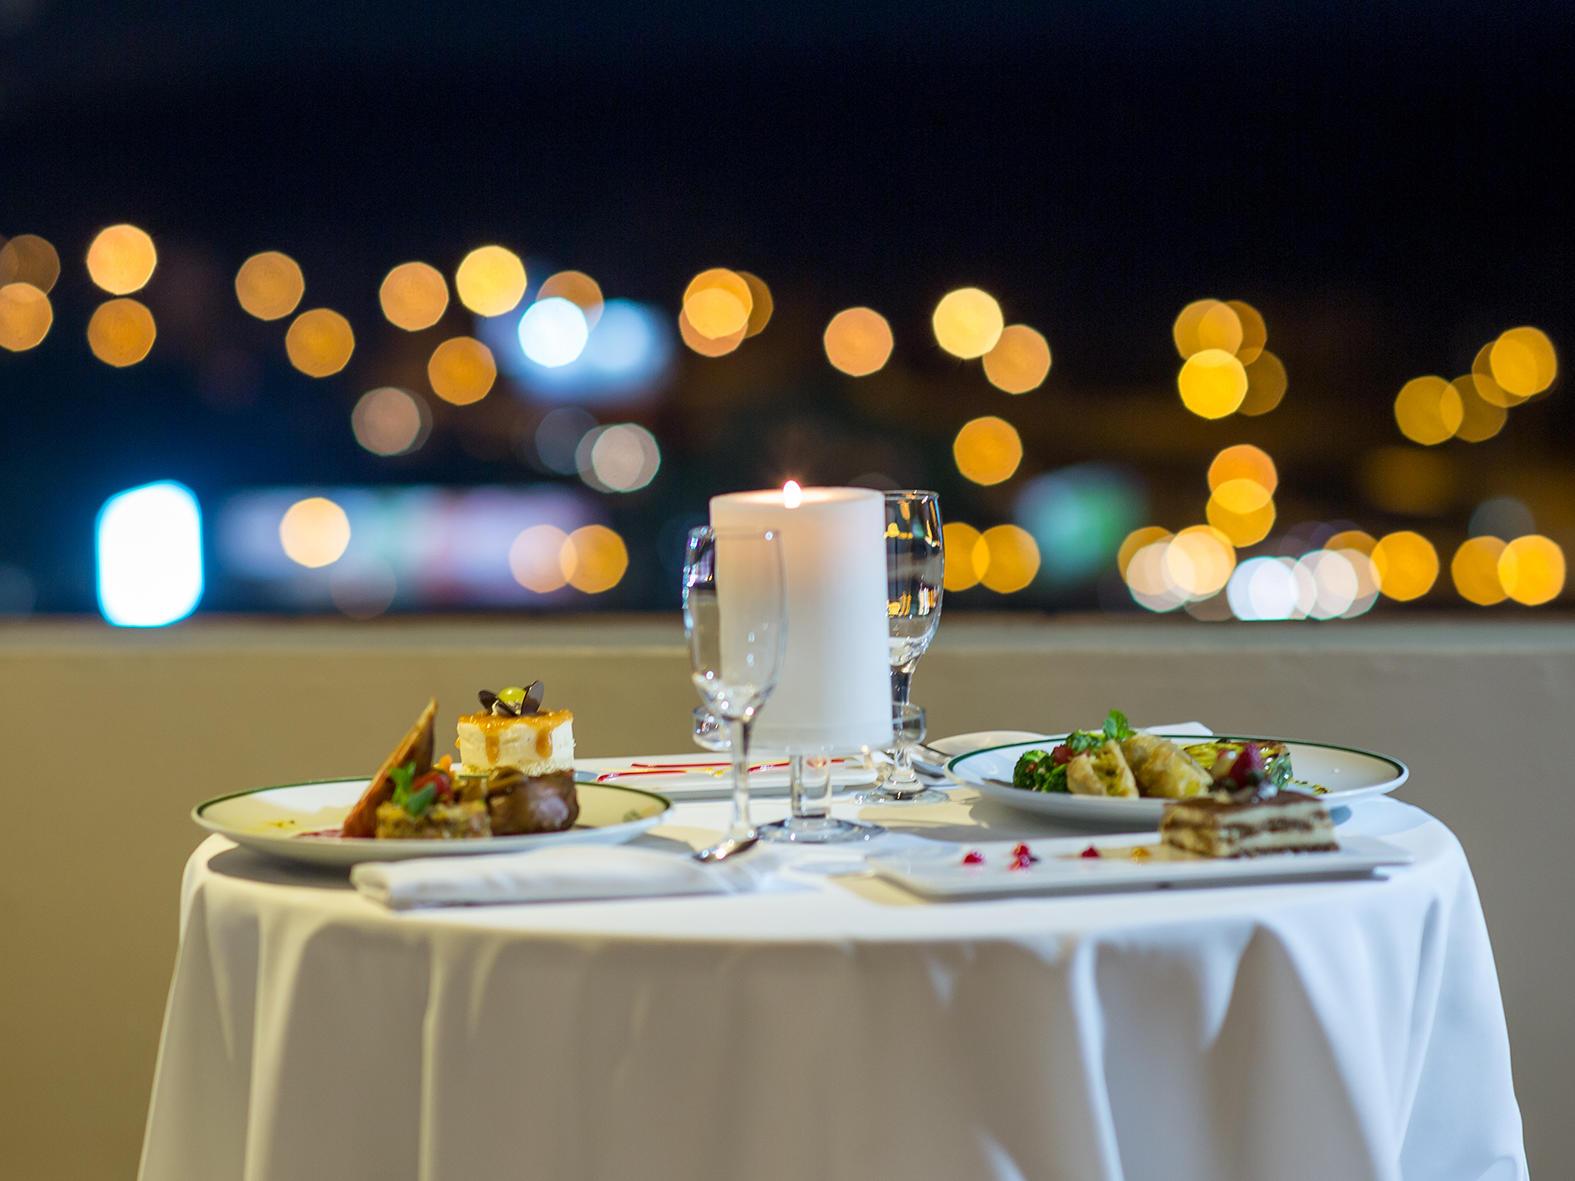 Cena de terrazo